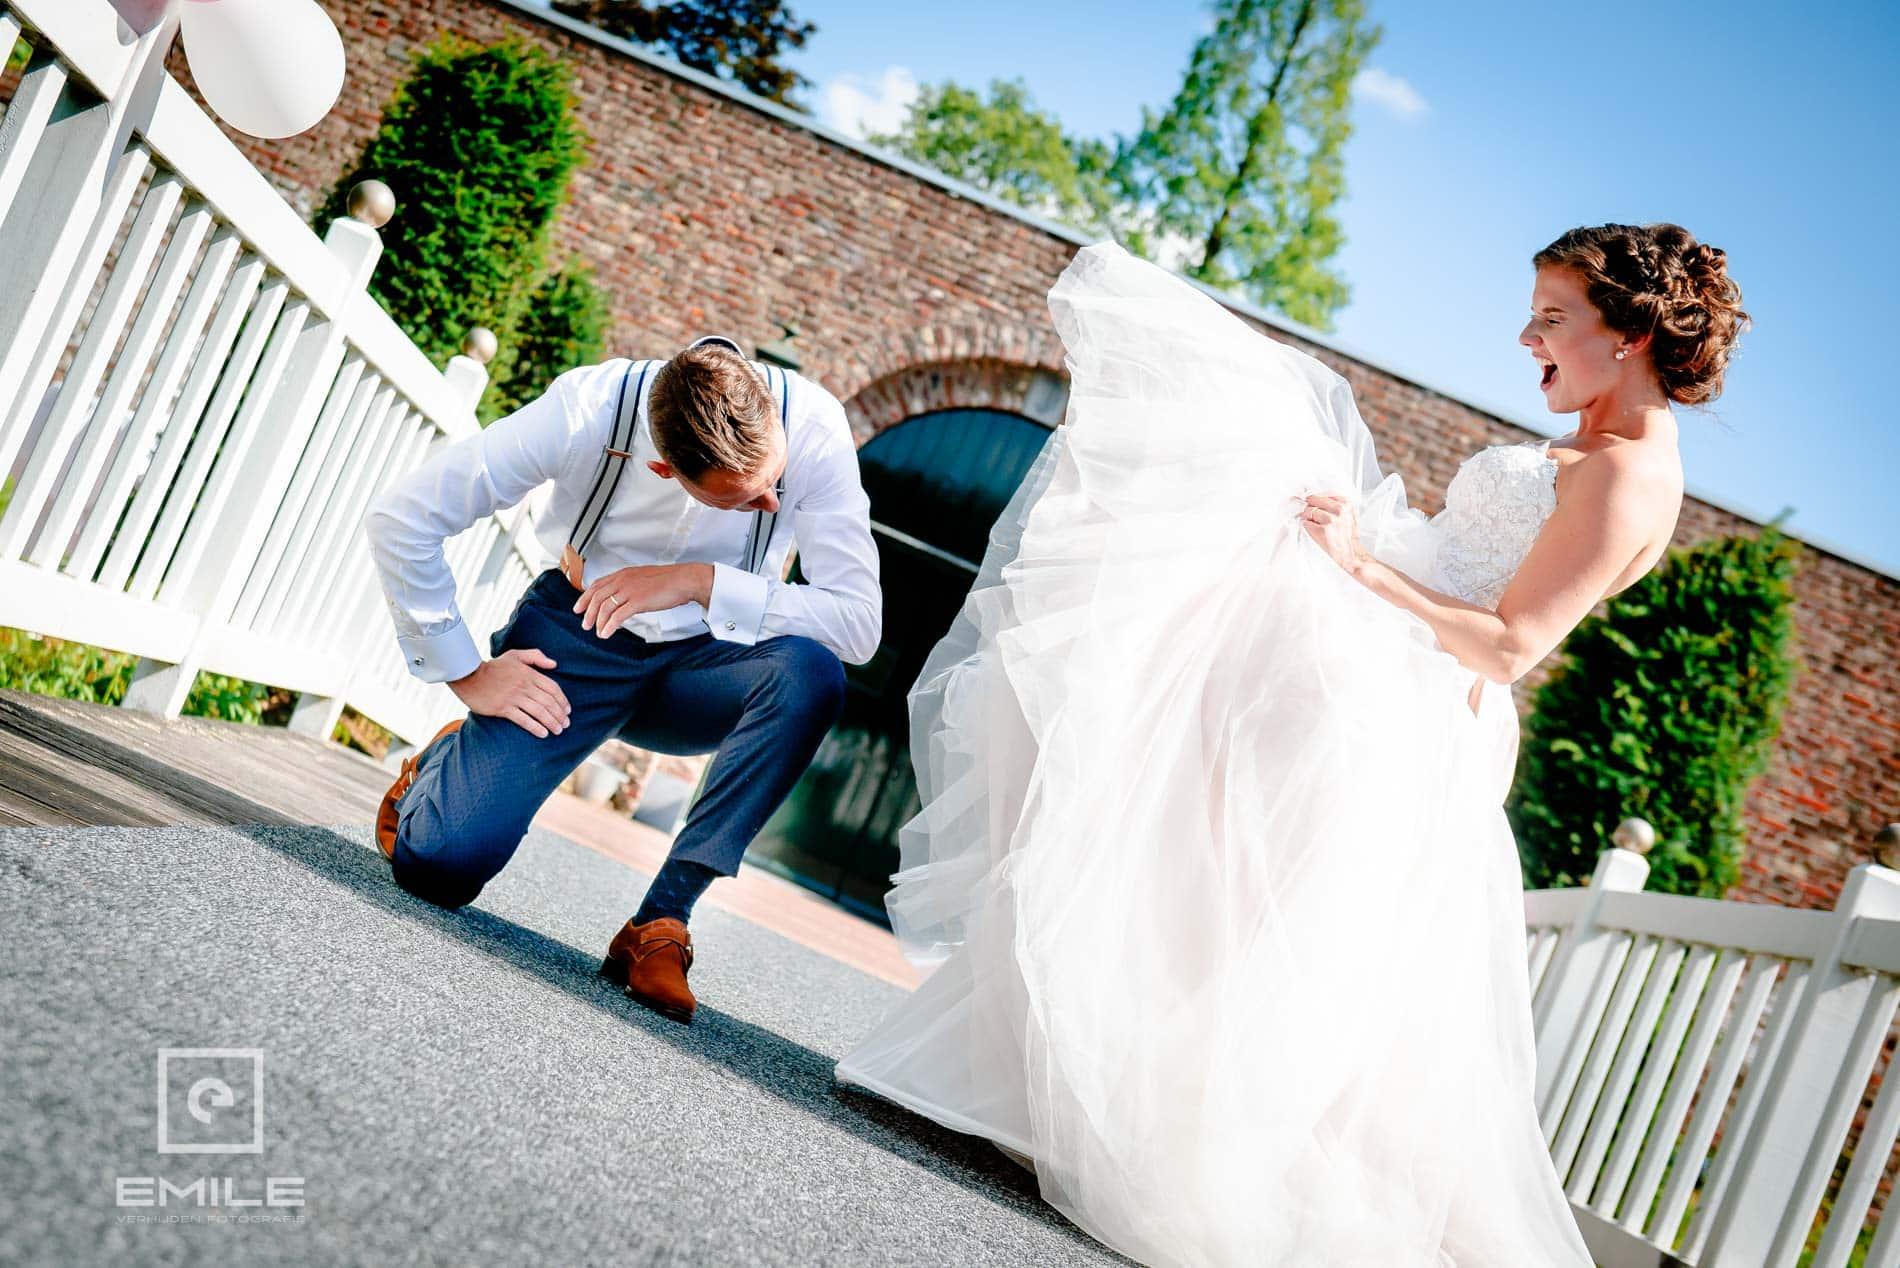 Bruidsfotograaf Limburg - Kasteel Daelenbroeck - Herkenbosch